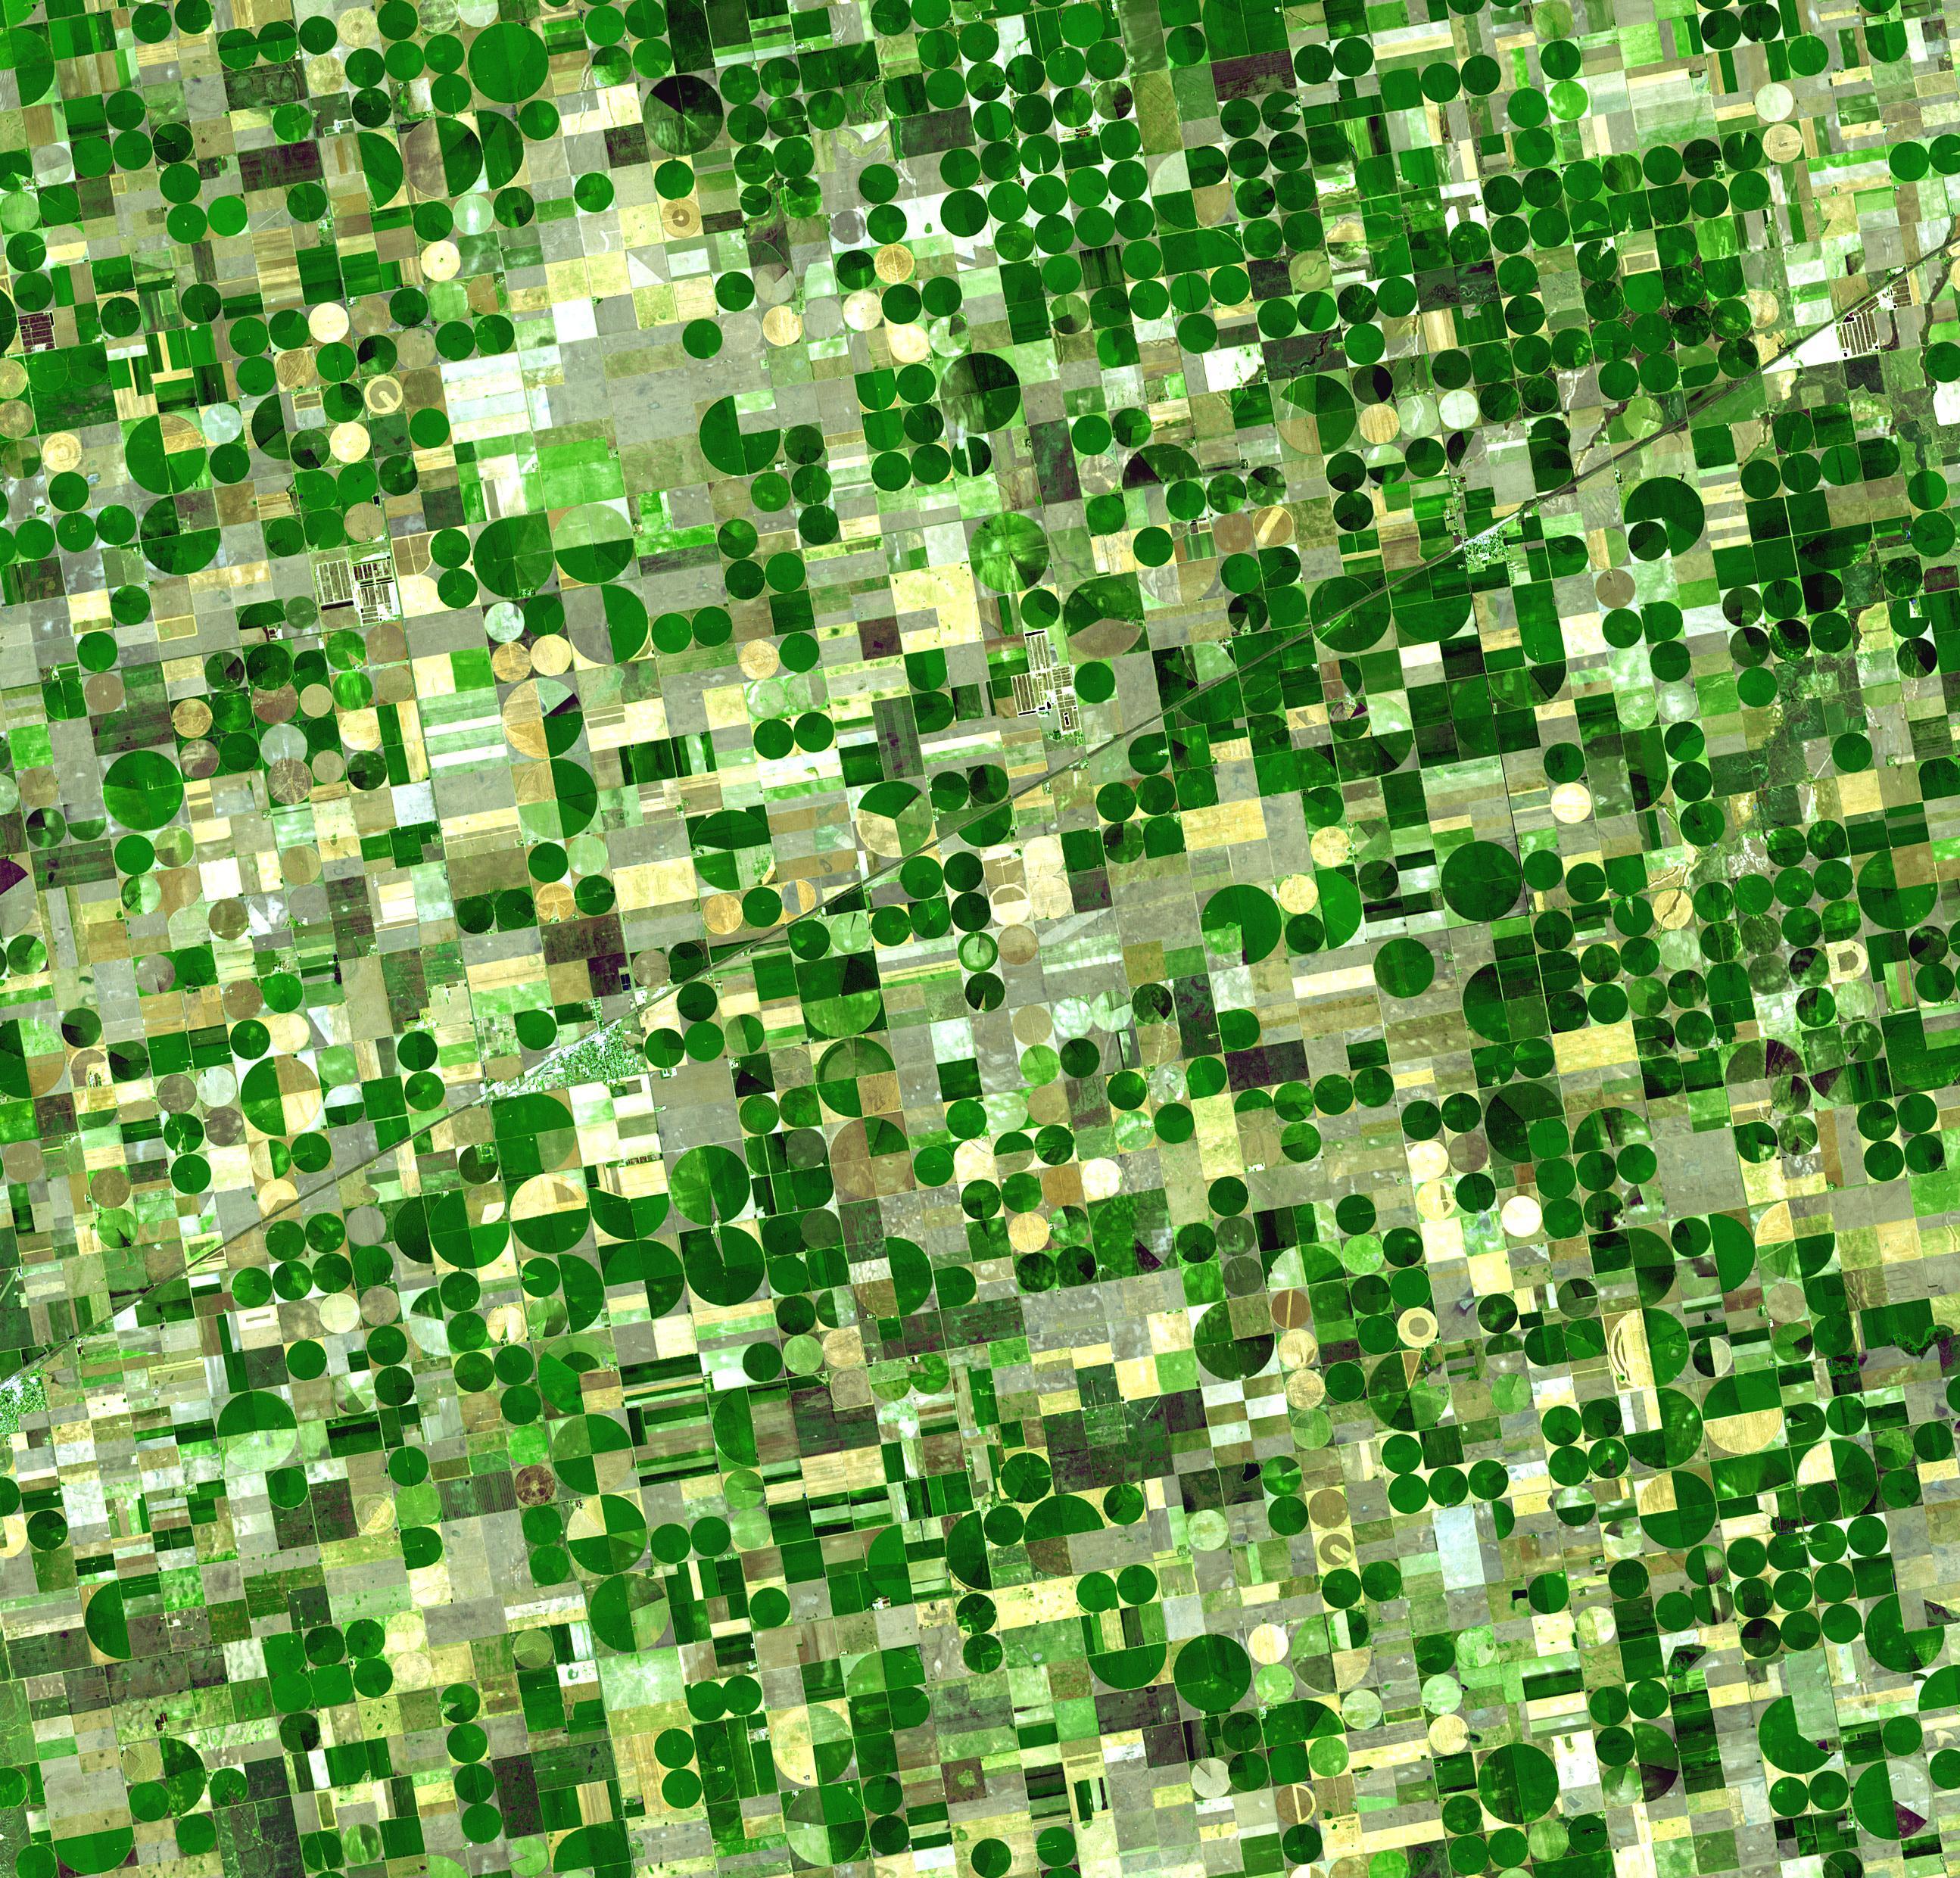 Kansas Crop Circles. Image courtesy of NASA/GSFC/METI/ERSDAC/JAROS, and U.S./Japan ASTER Science Team.